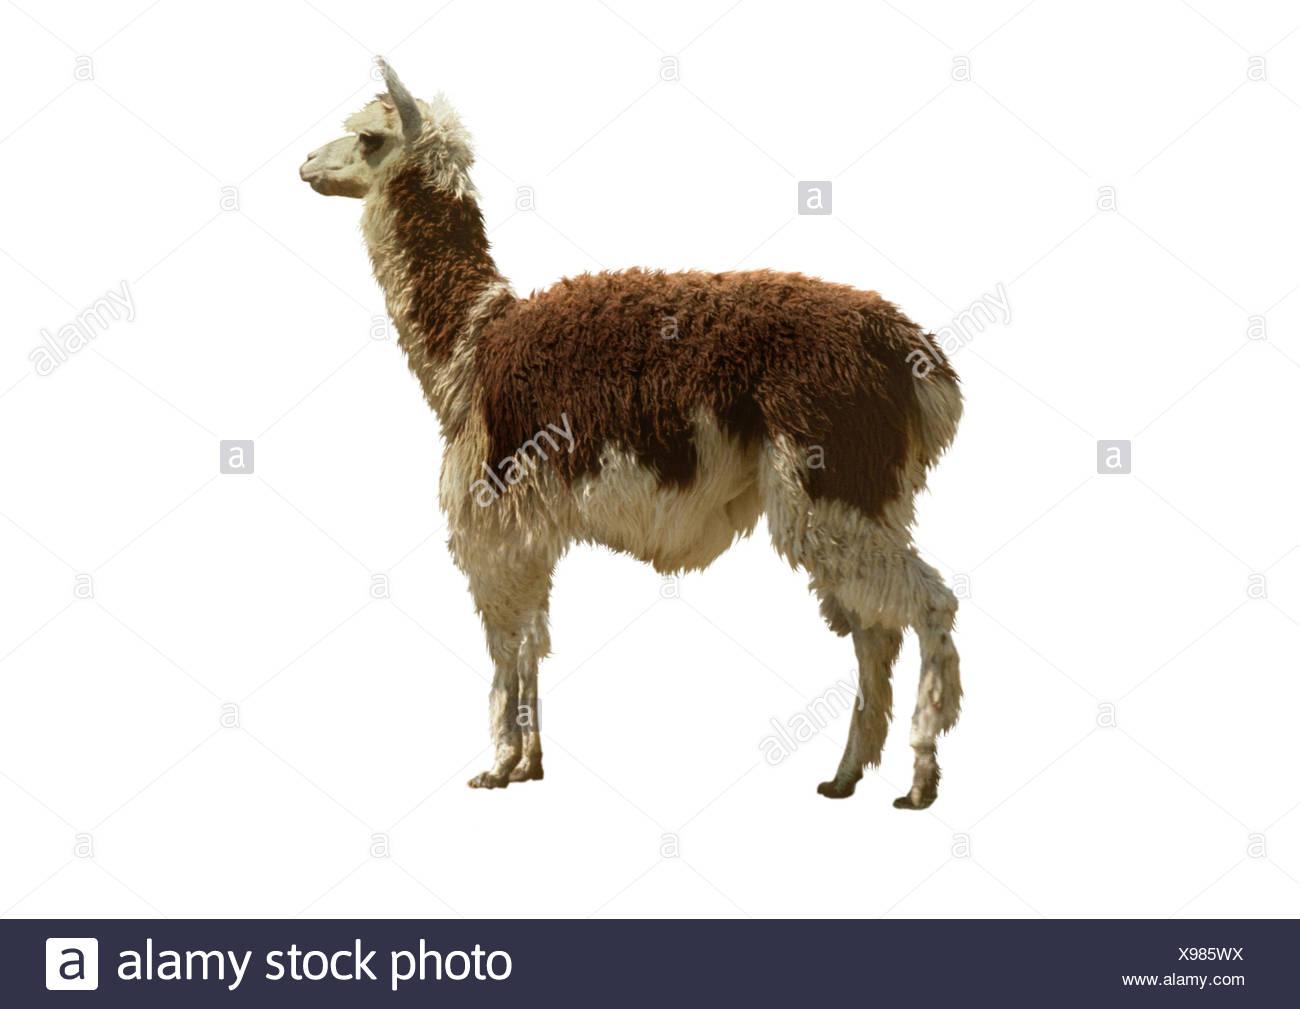 llama (Lama glama), cutted out - Stock Image